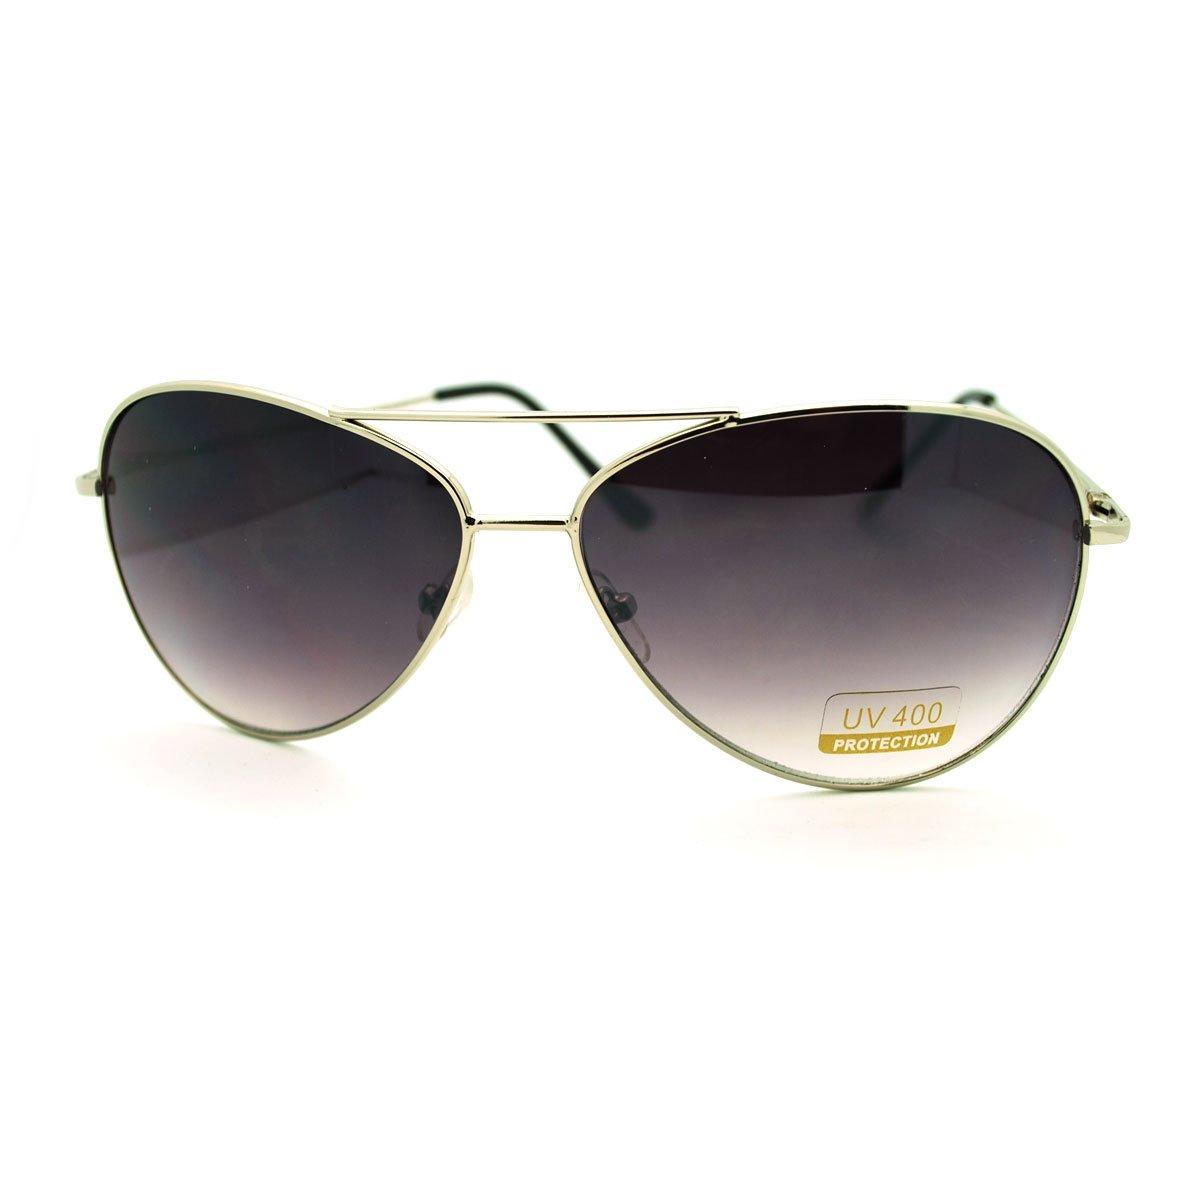 Classic Aviator Sunglasses Simple Timeless Cop Pilot Aviators